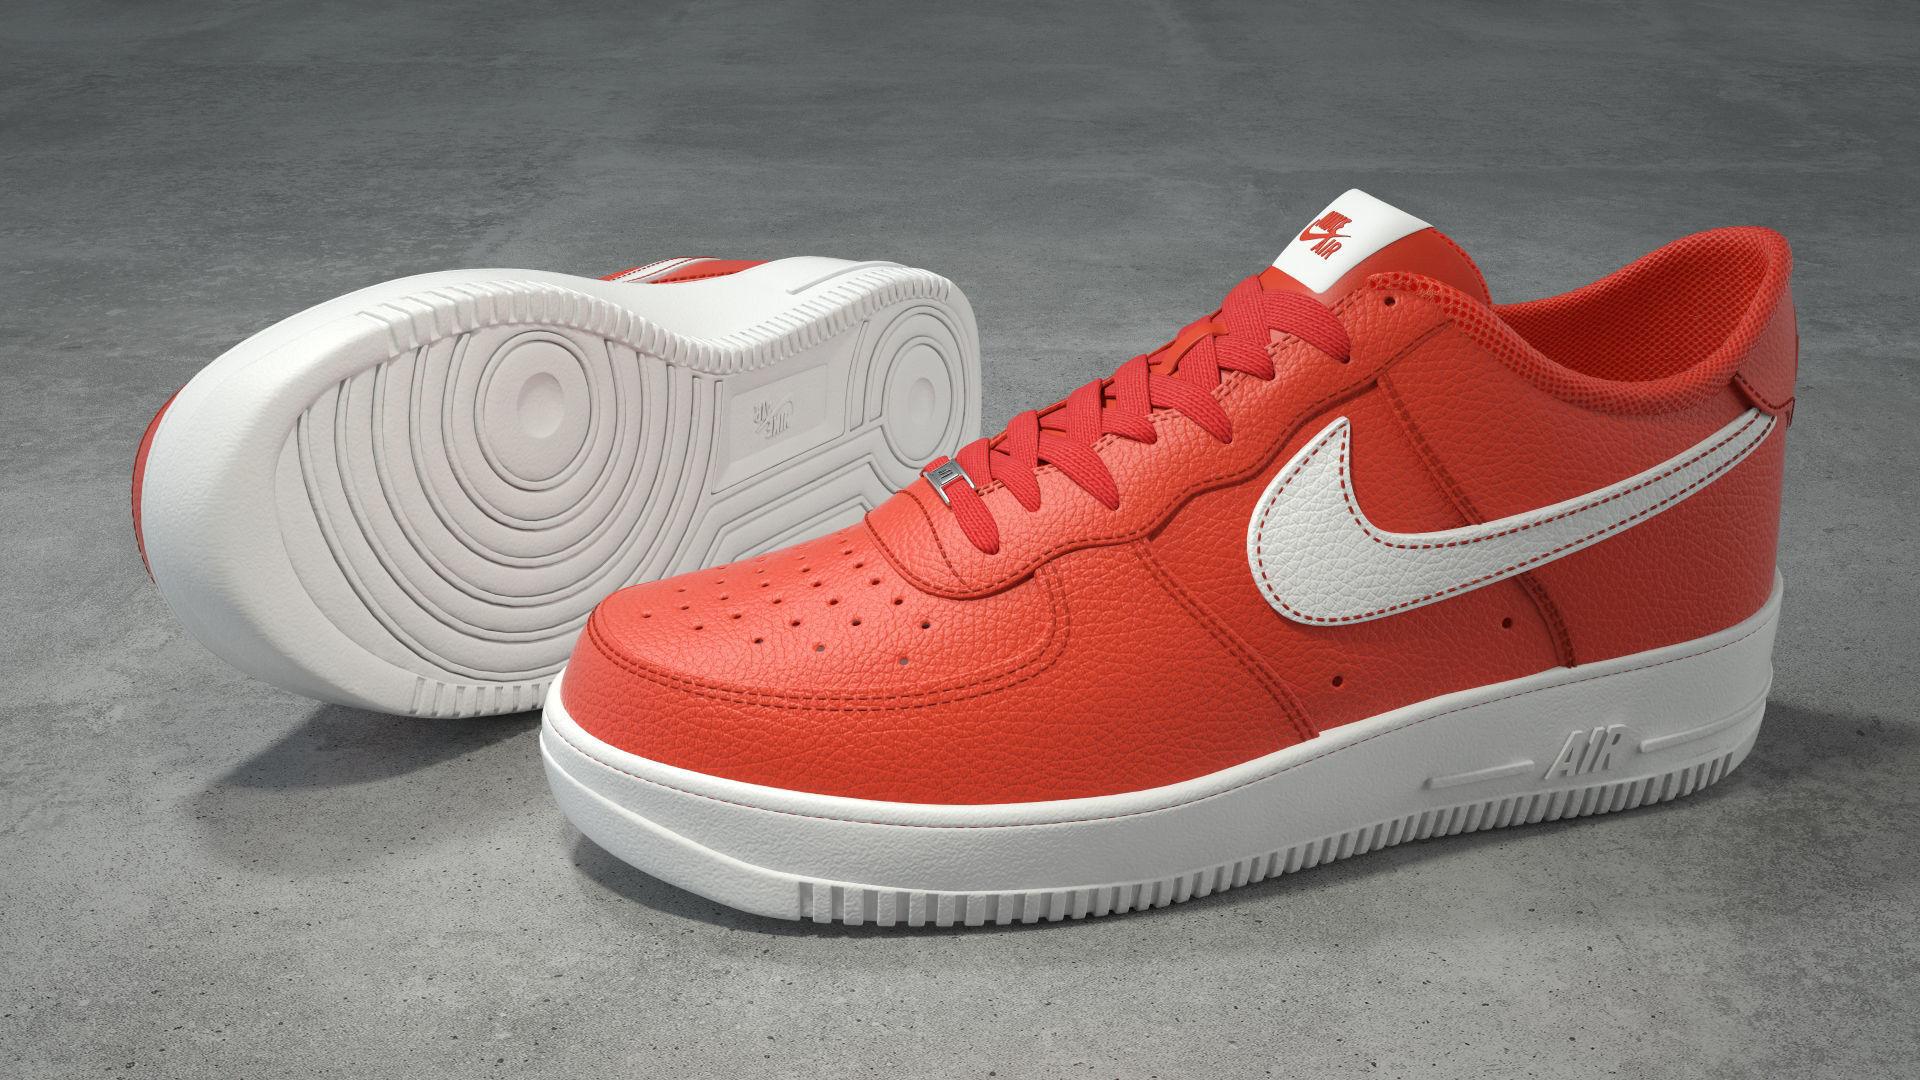 Nike Air Force 1 low team orange